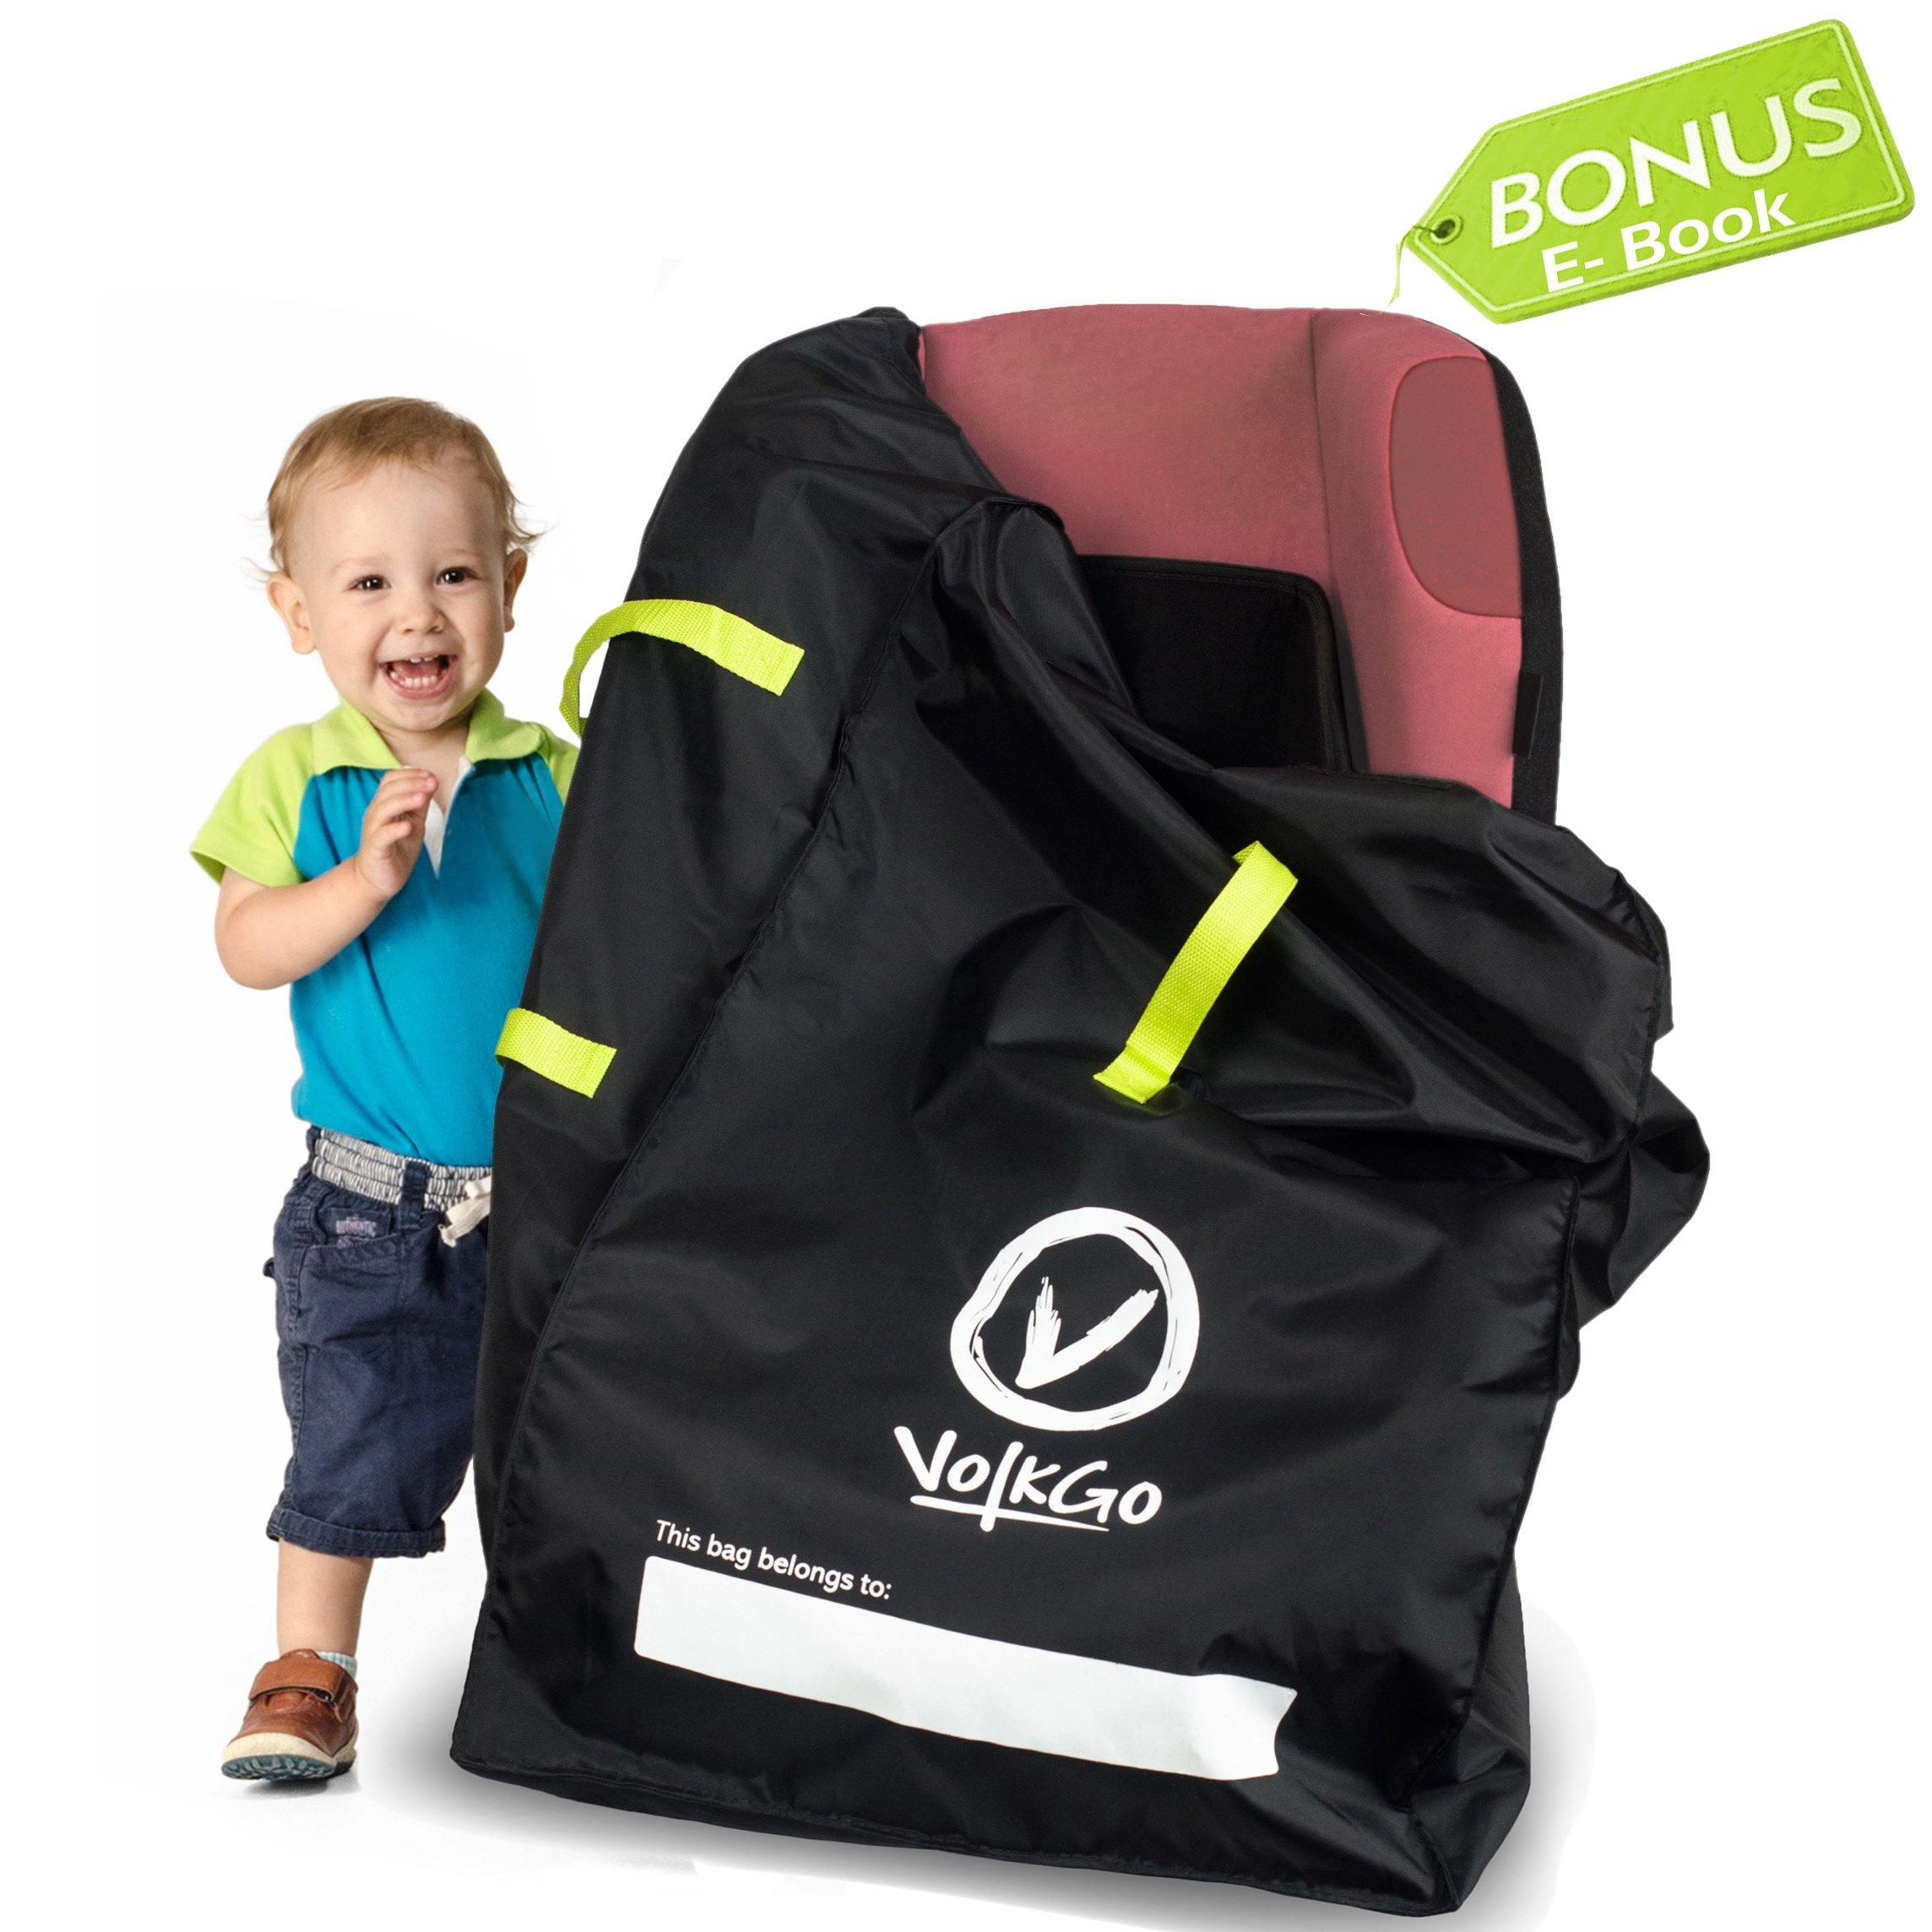 VolkGo DURABLE Car Seat Travel Bag With BONUS E BOOK Ideal Gate Check